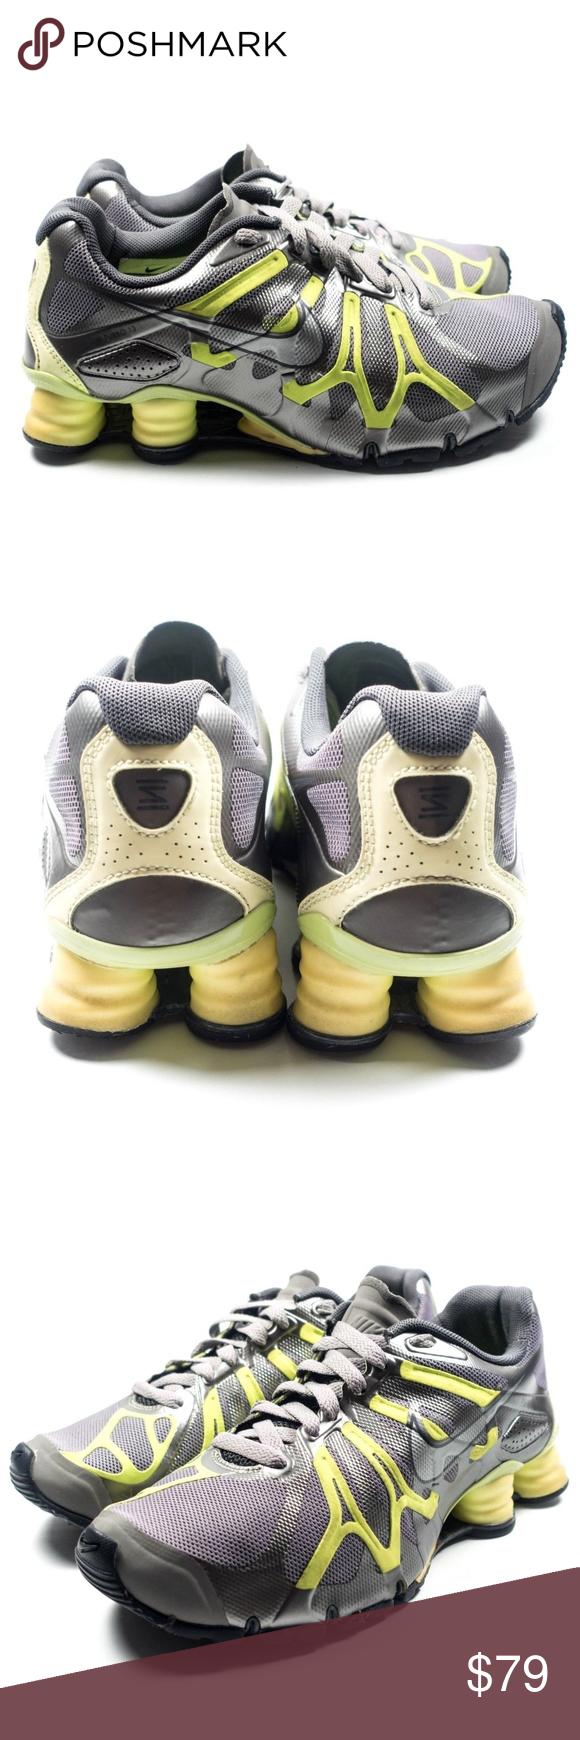 low priced cc730 251ac Nike Shox Turbo 13 Running Shoes Size 7.5 Nike Shox Turbo 13 ...